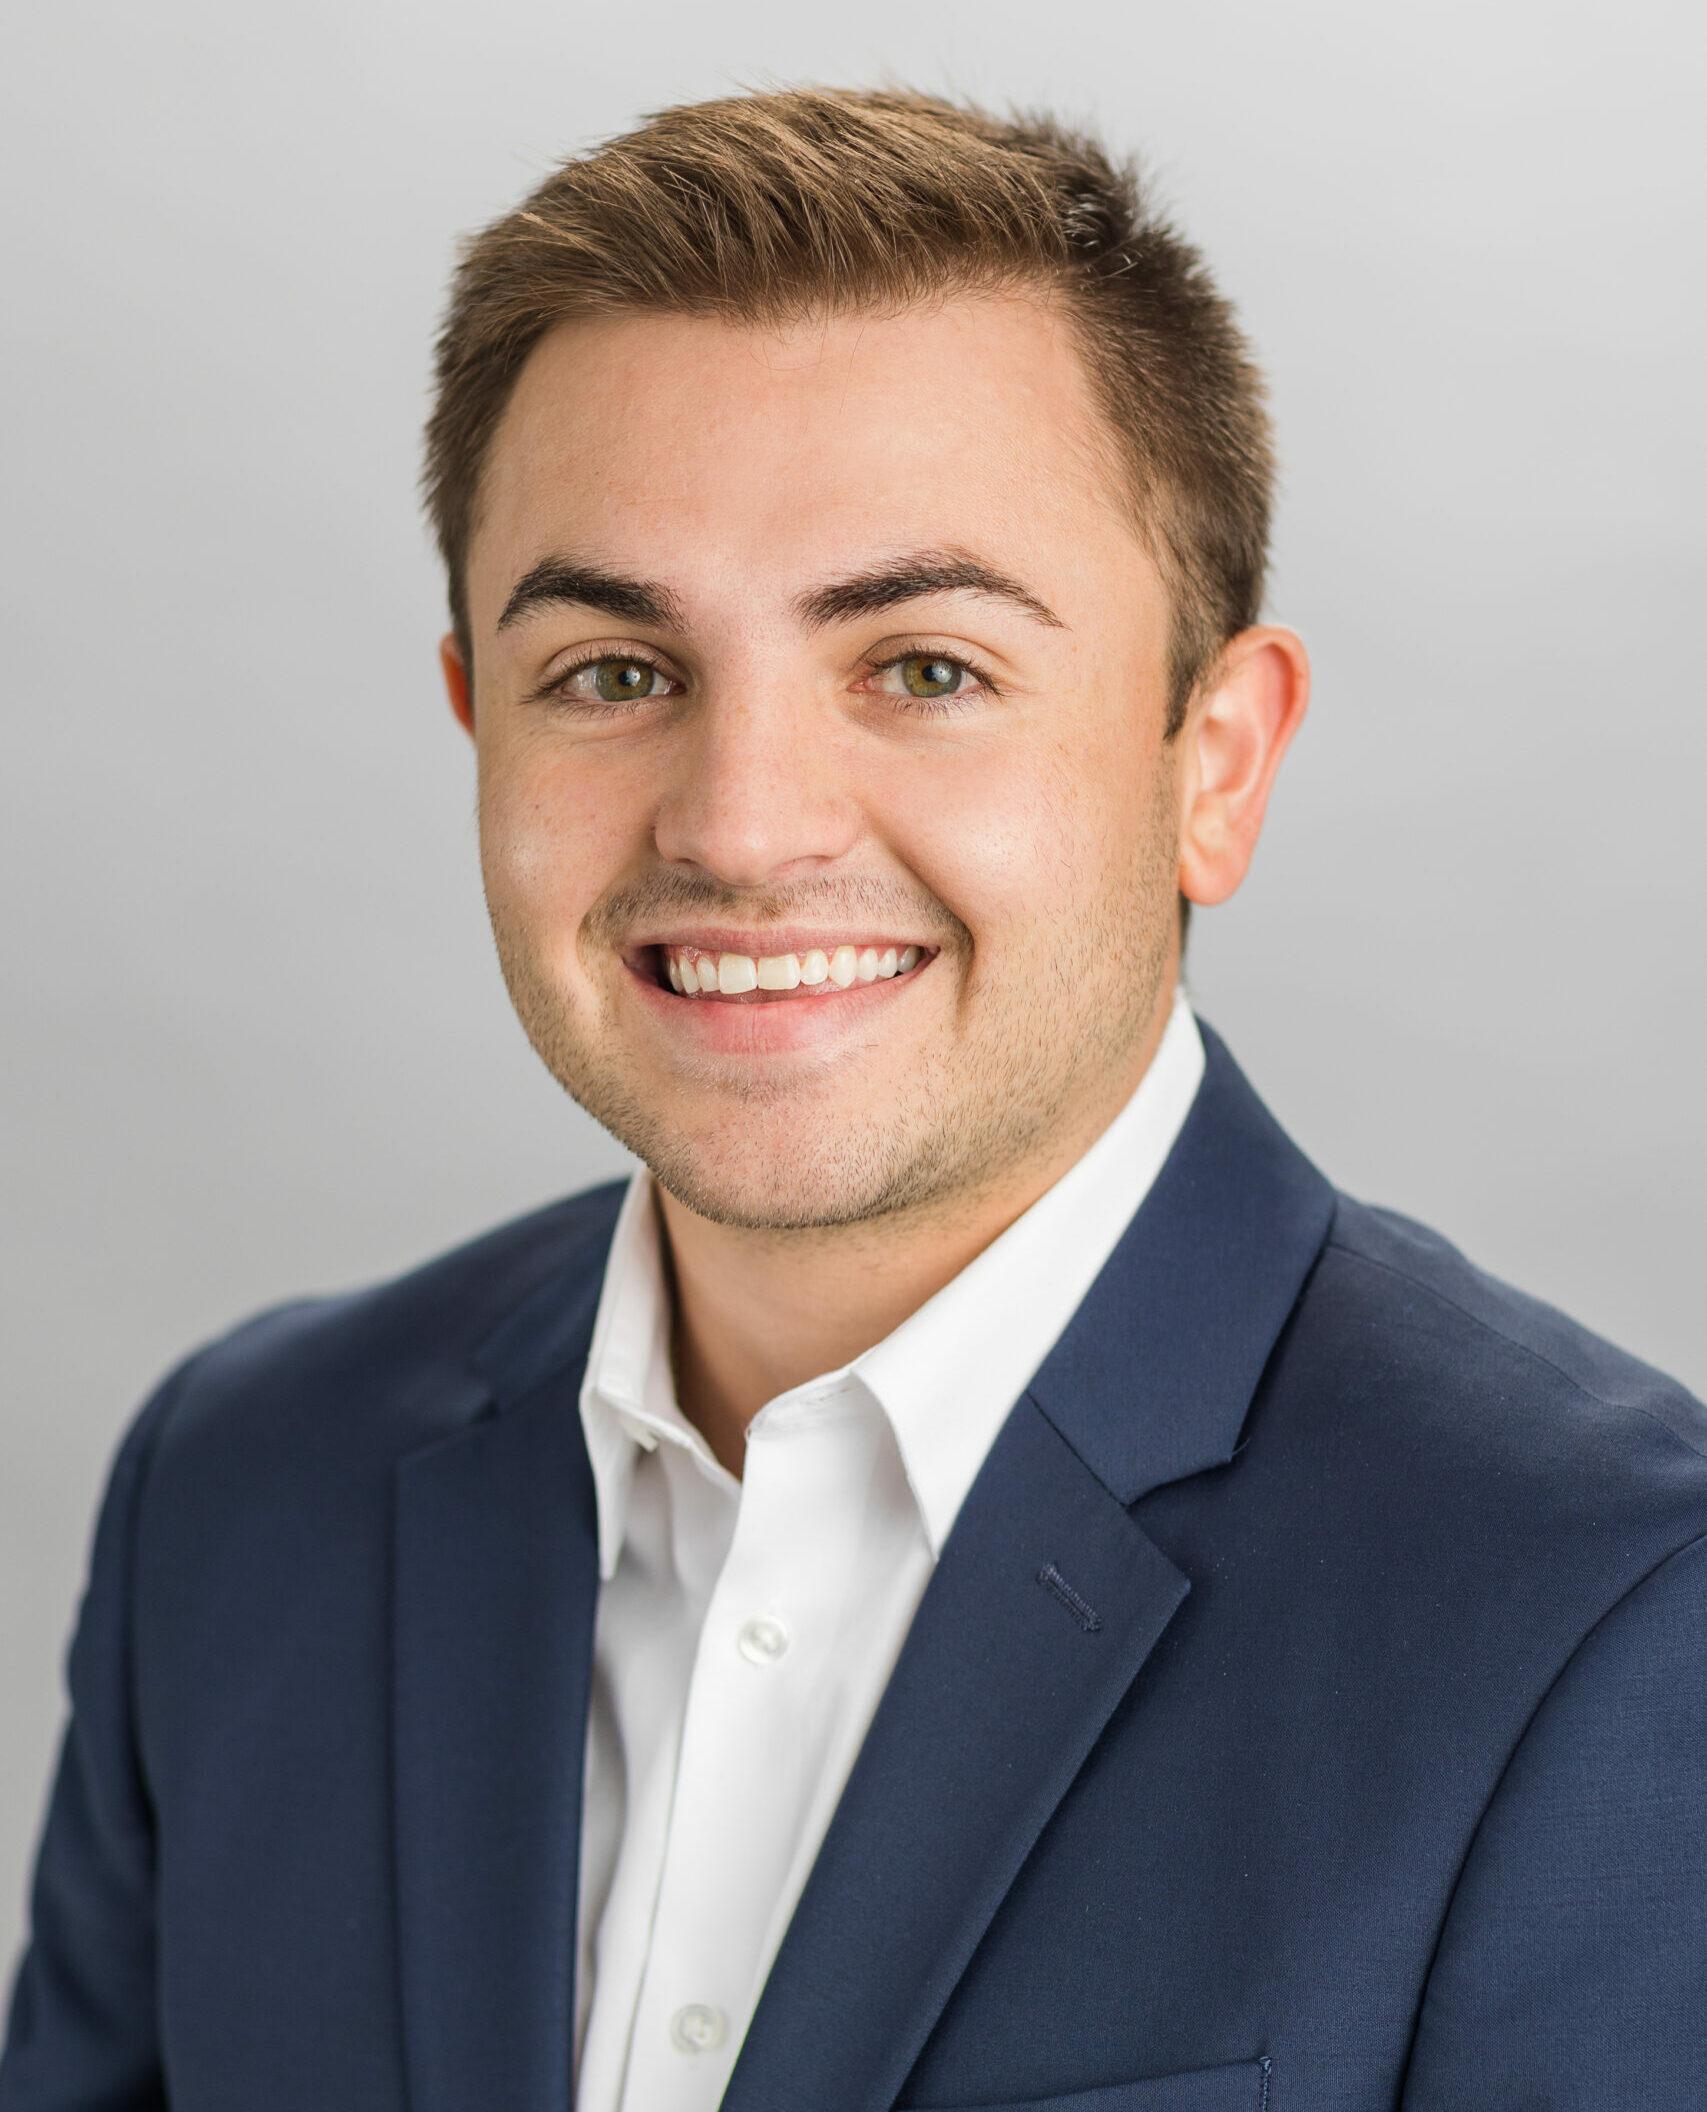 Michael Condoleon